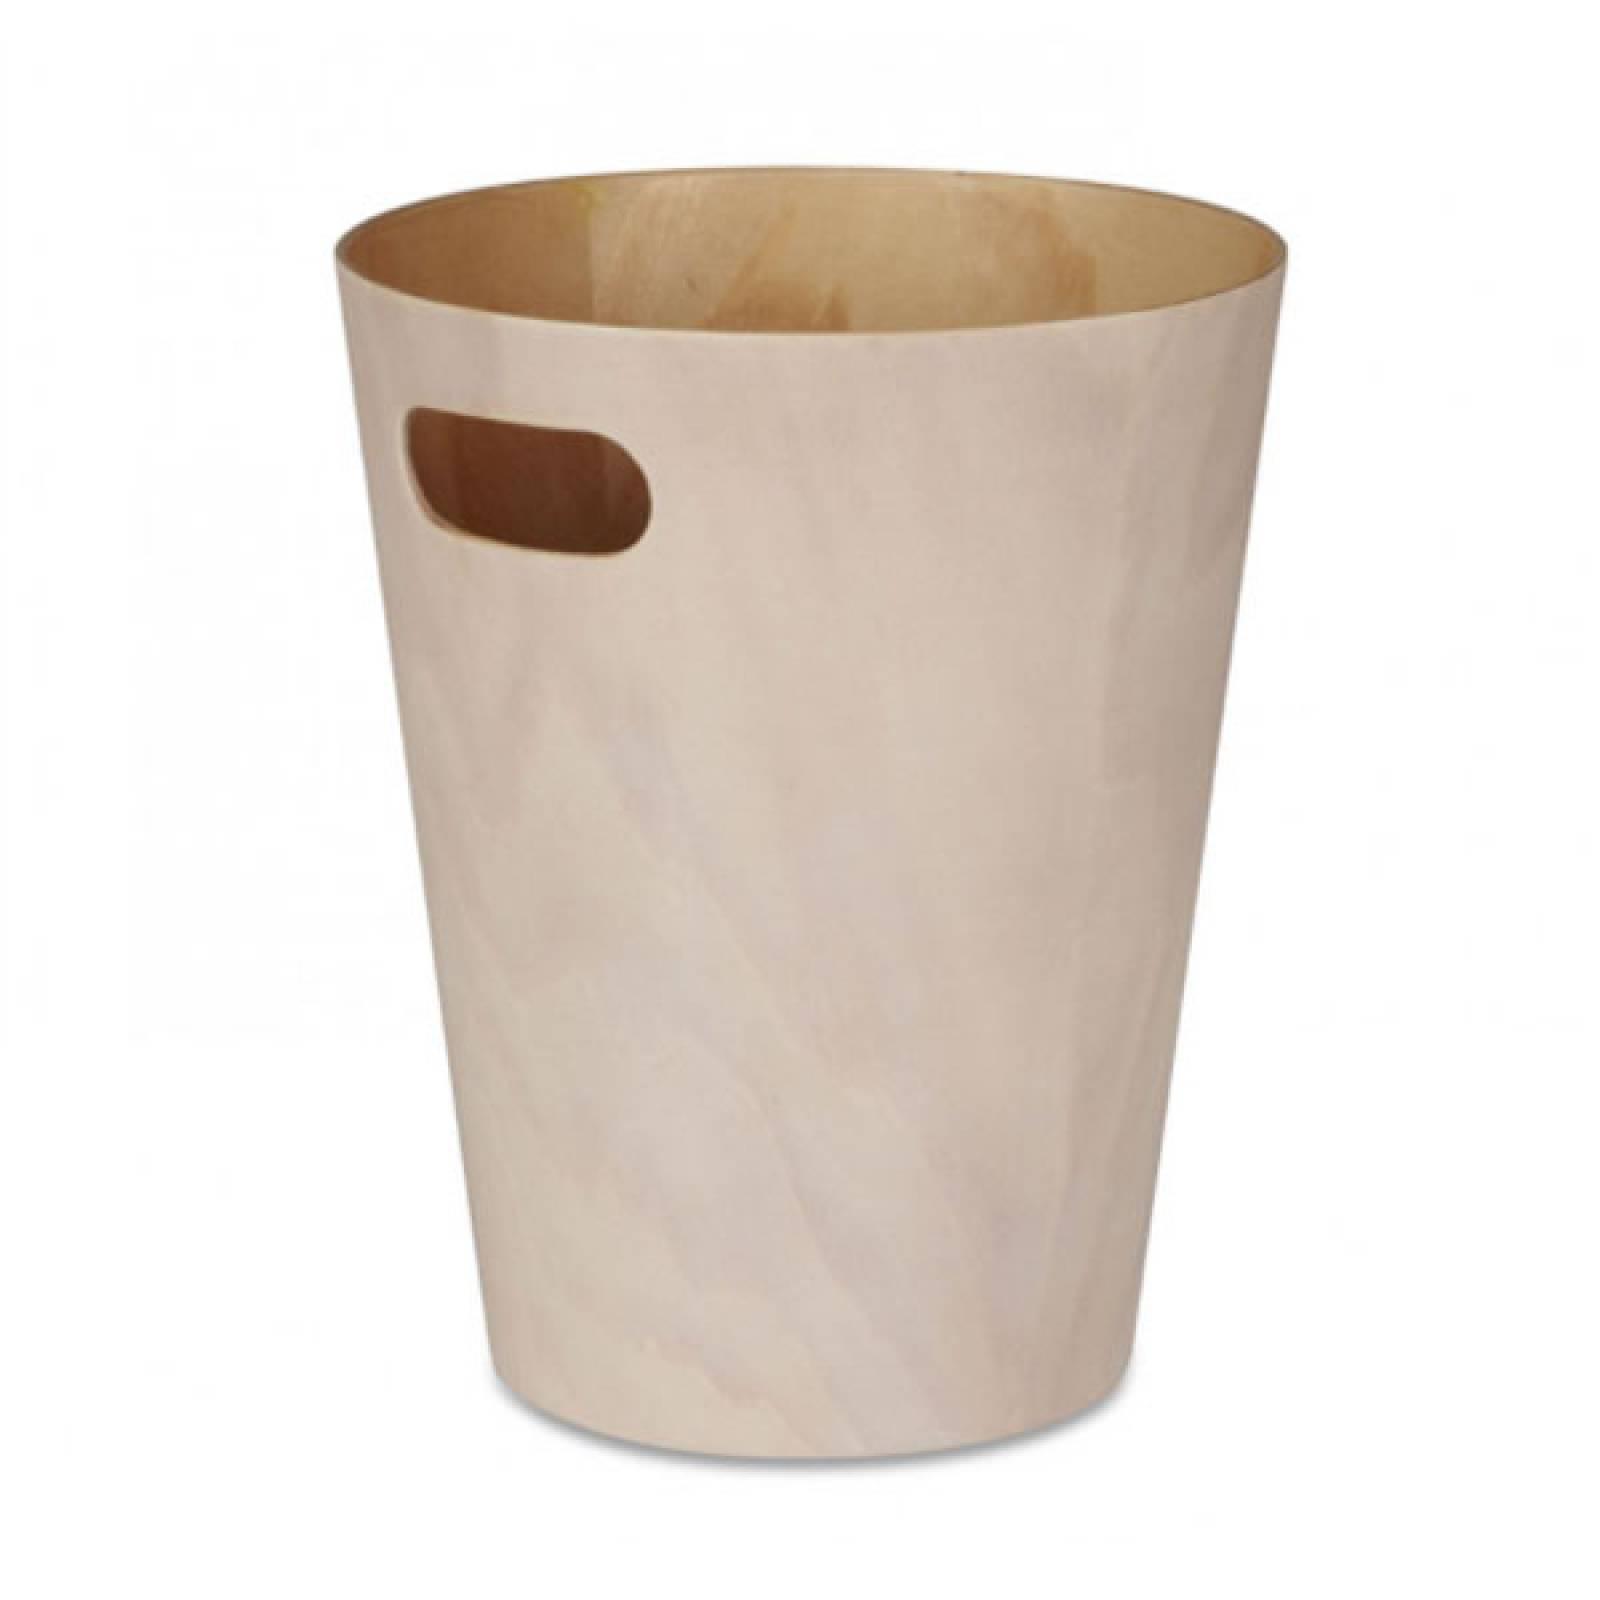 Woodrow Waste bin Natural / White